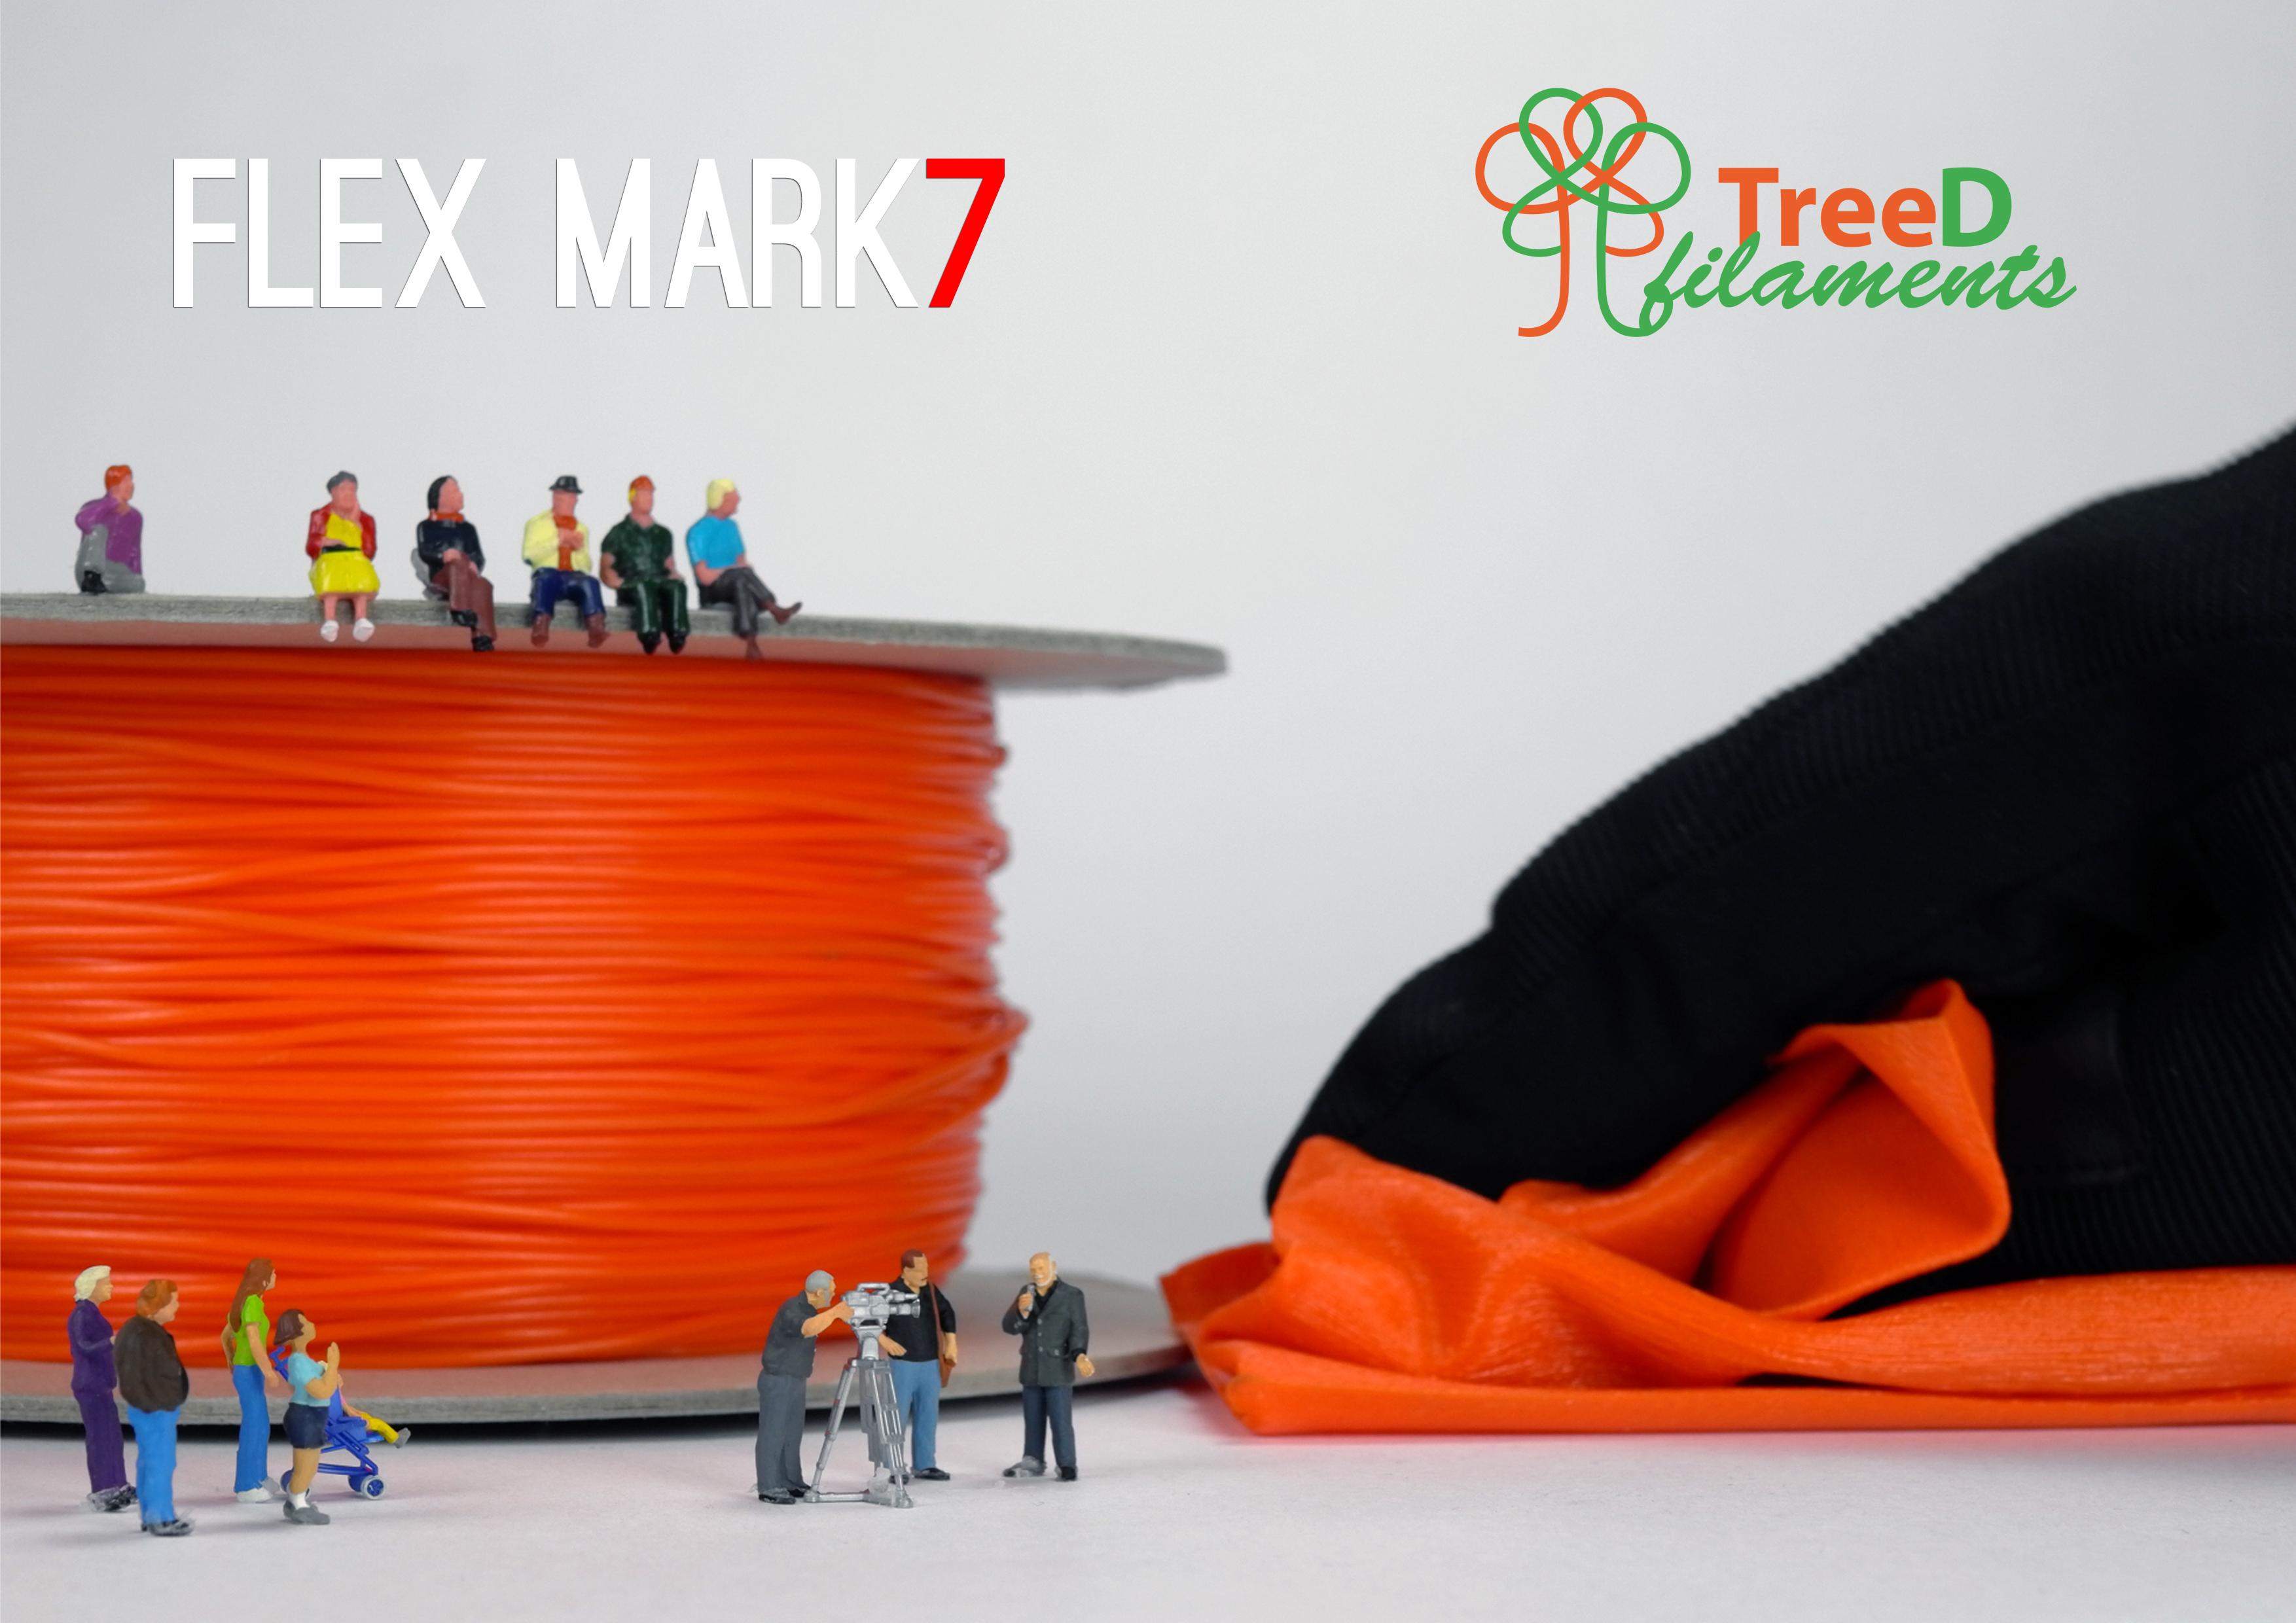 Treedfilaments Flexmark